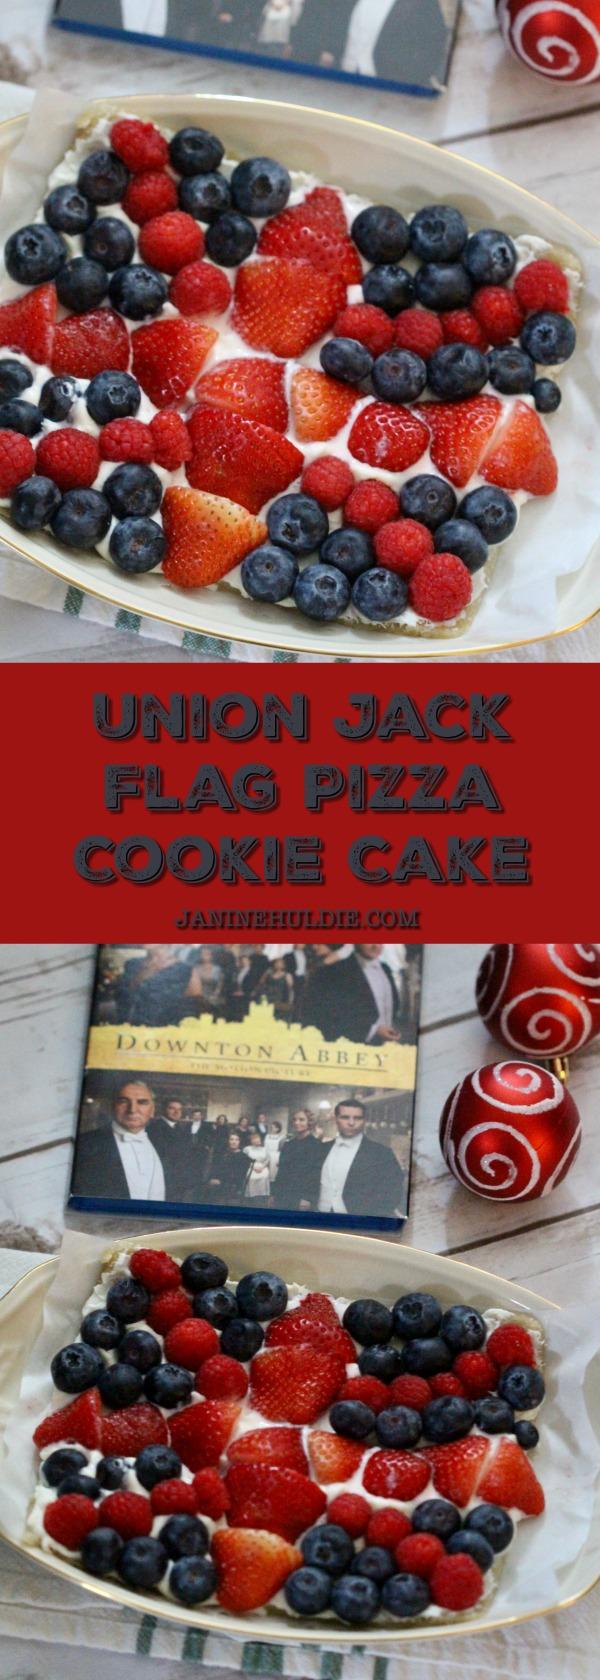 Union Jack Flag Pizza Cookie Cake 2